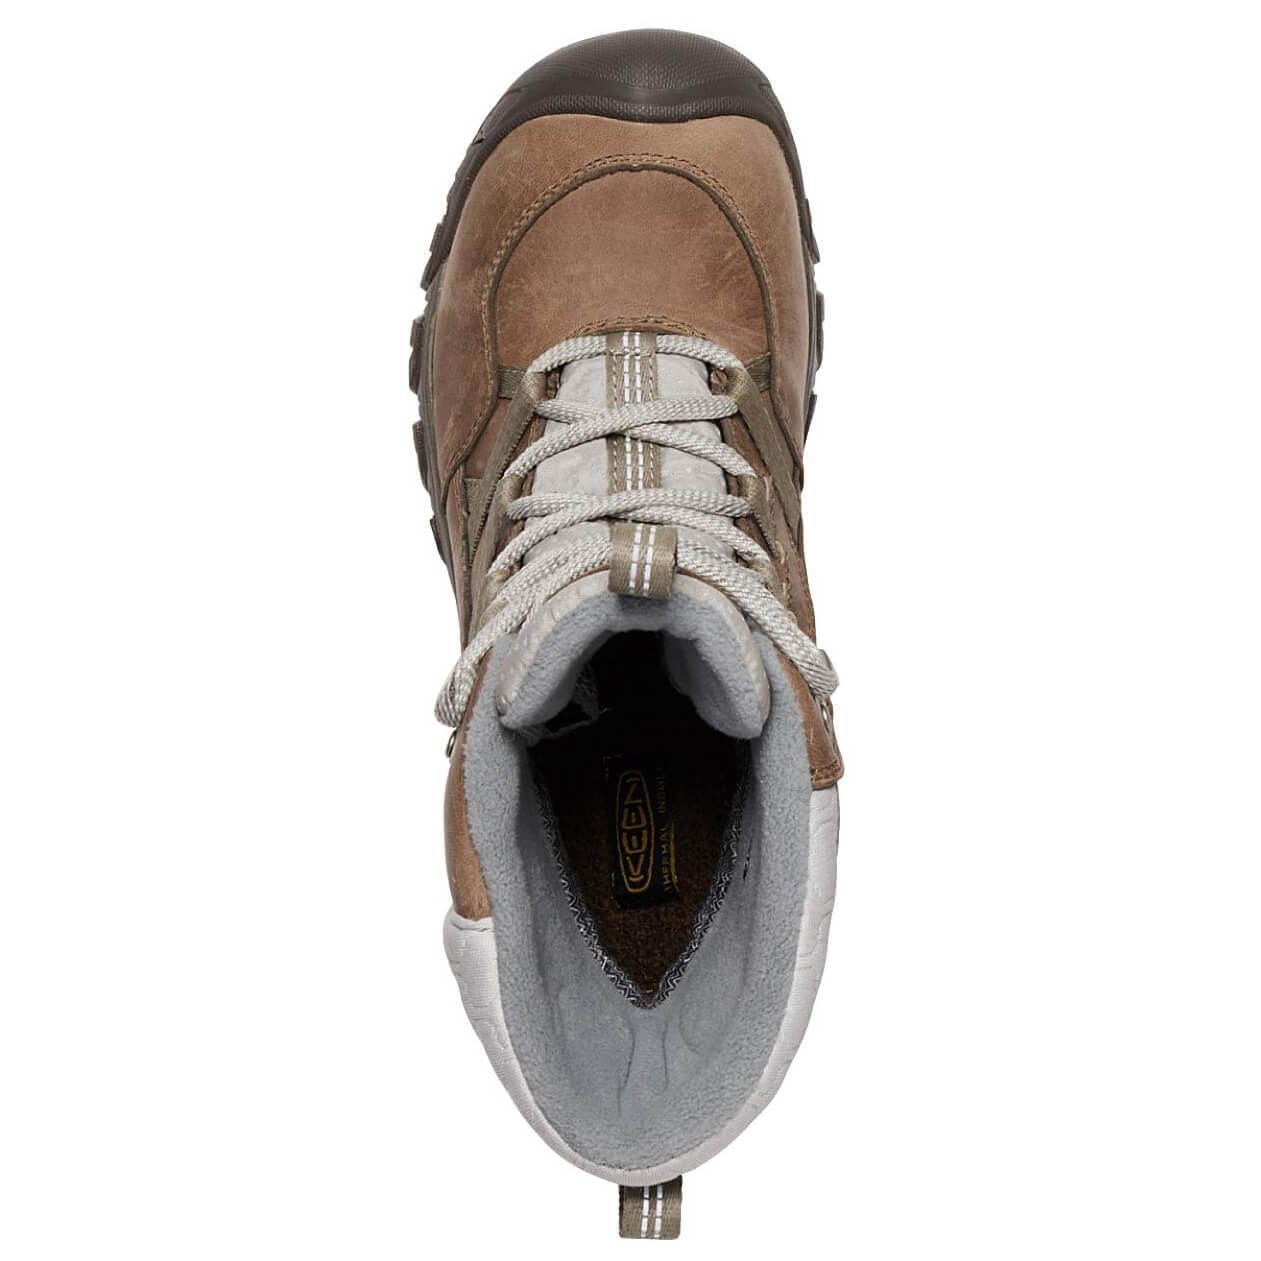 4c9107271a70 ... Keen - Women s Hoodoo III Lace Up - Winter boots ...